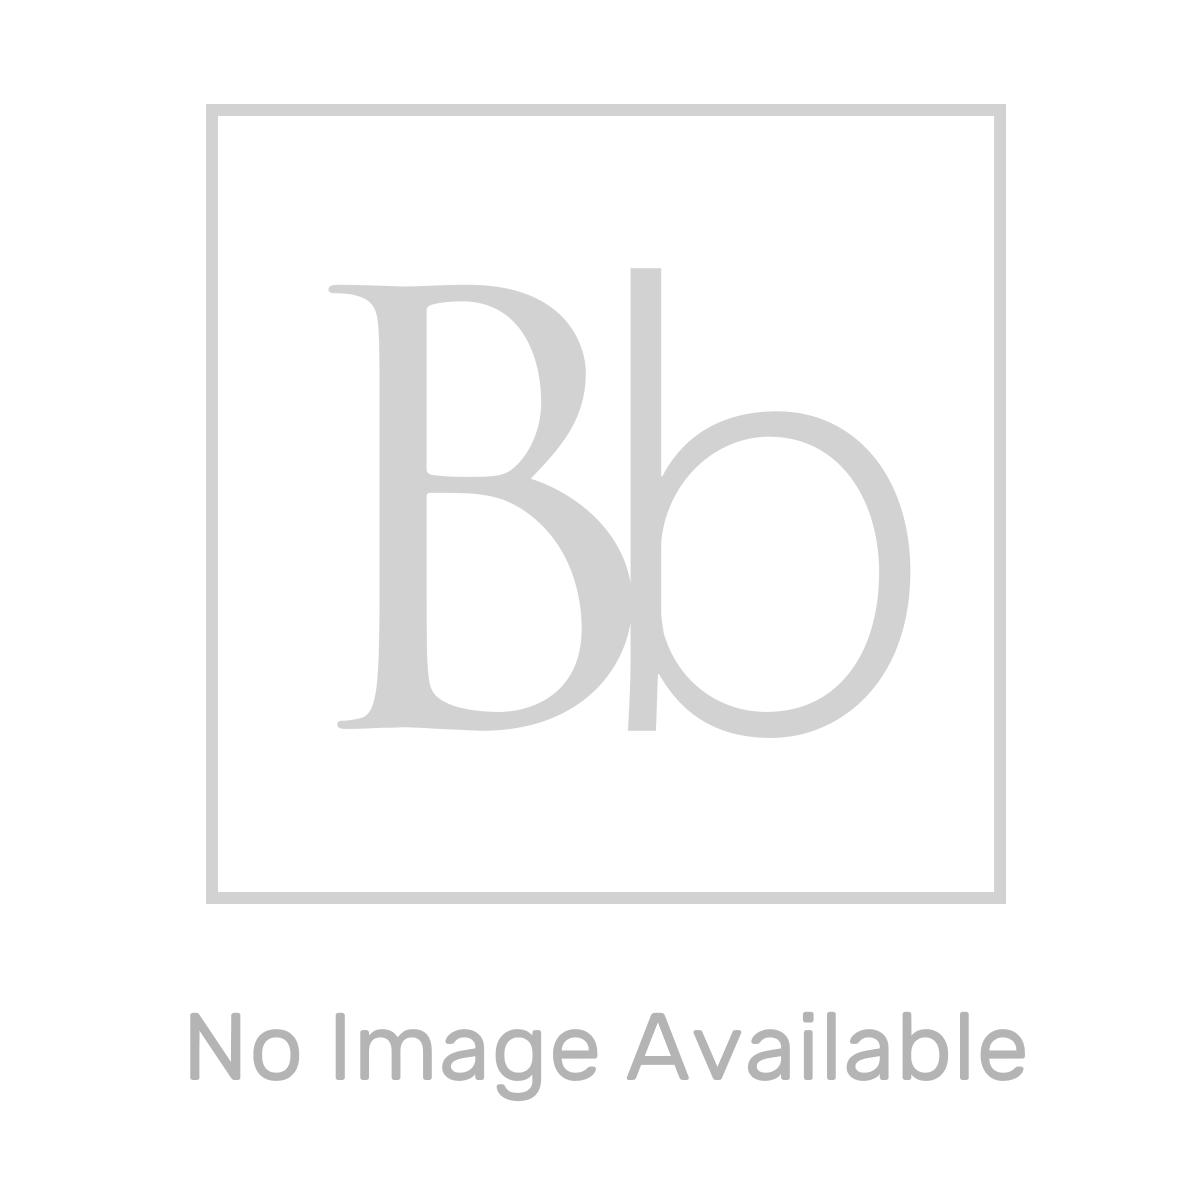 Nuie Athena Hacienda Black Double Door Tall Unit 300mm Line Drawing